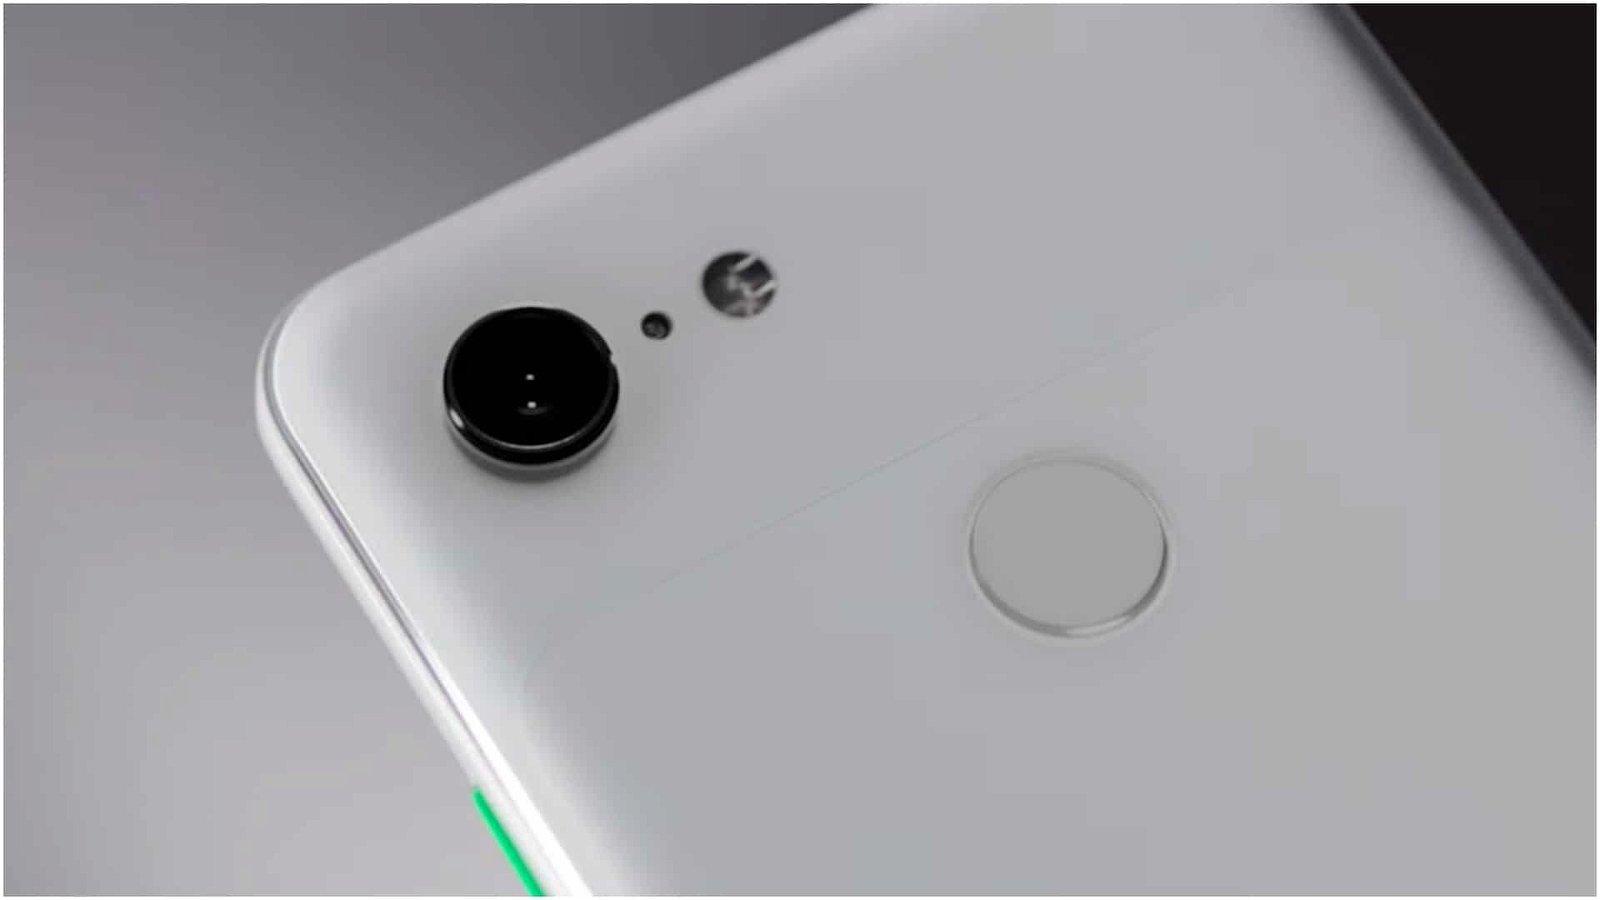 Google Announces Pixel 3, Emphasizes Camera Upgrades 1